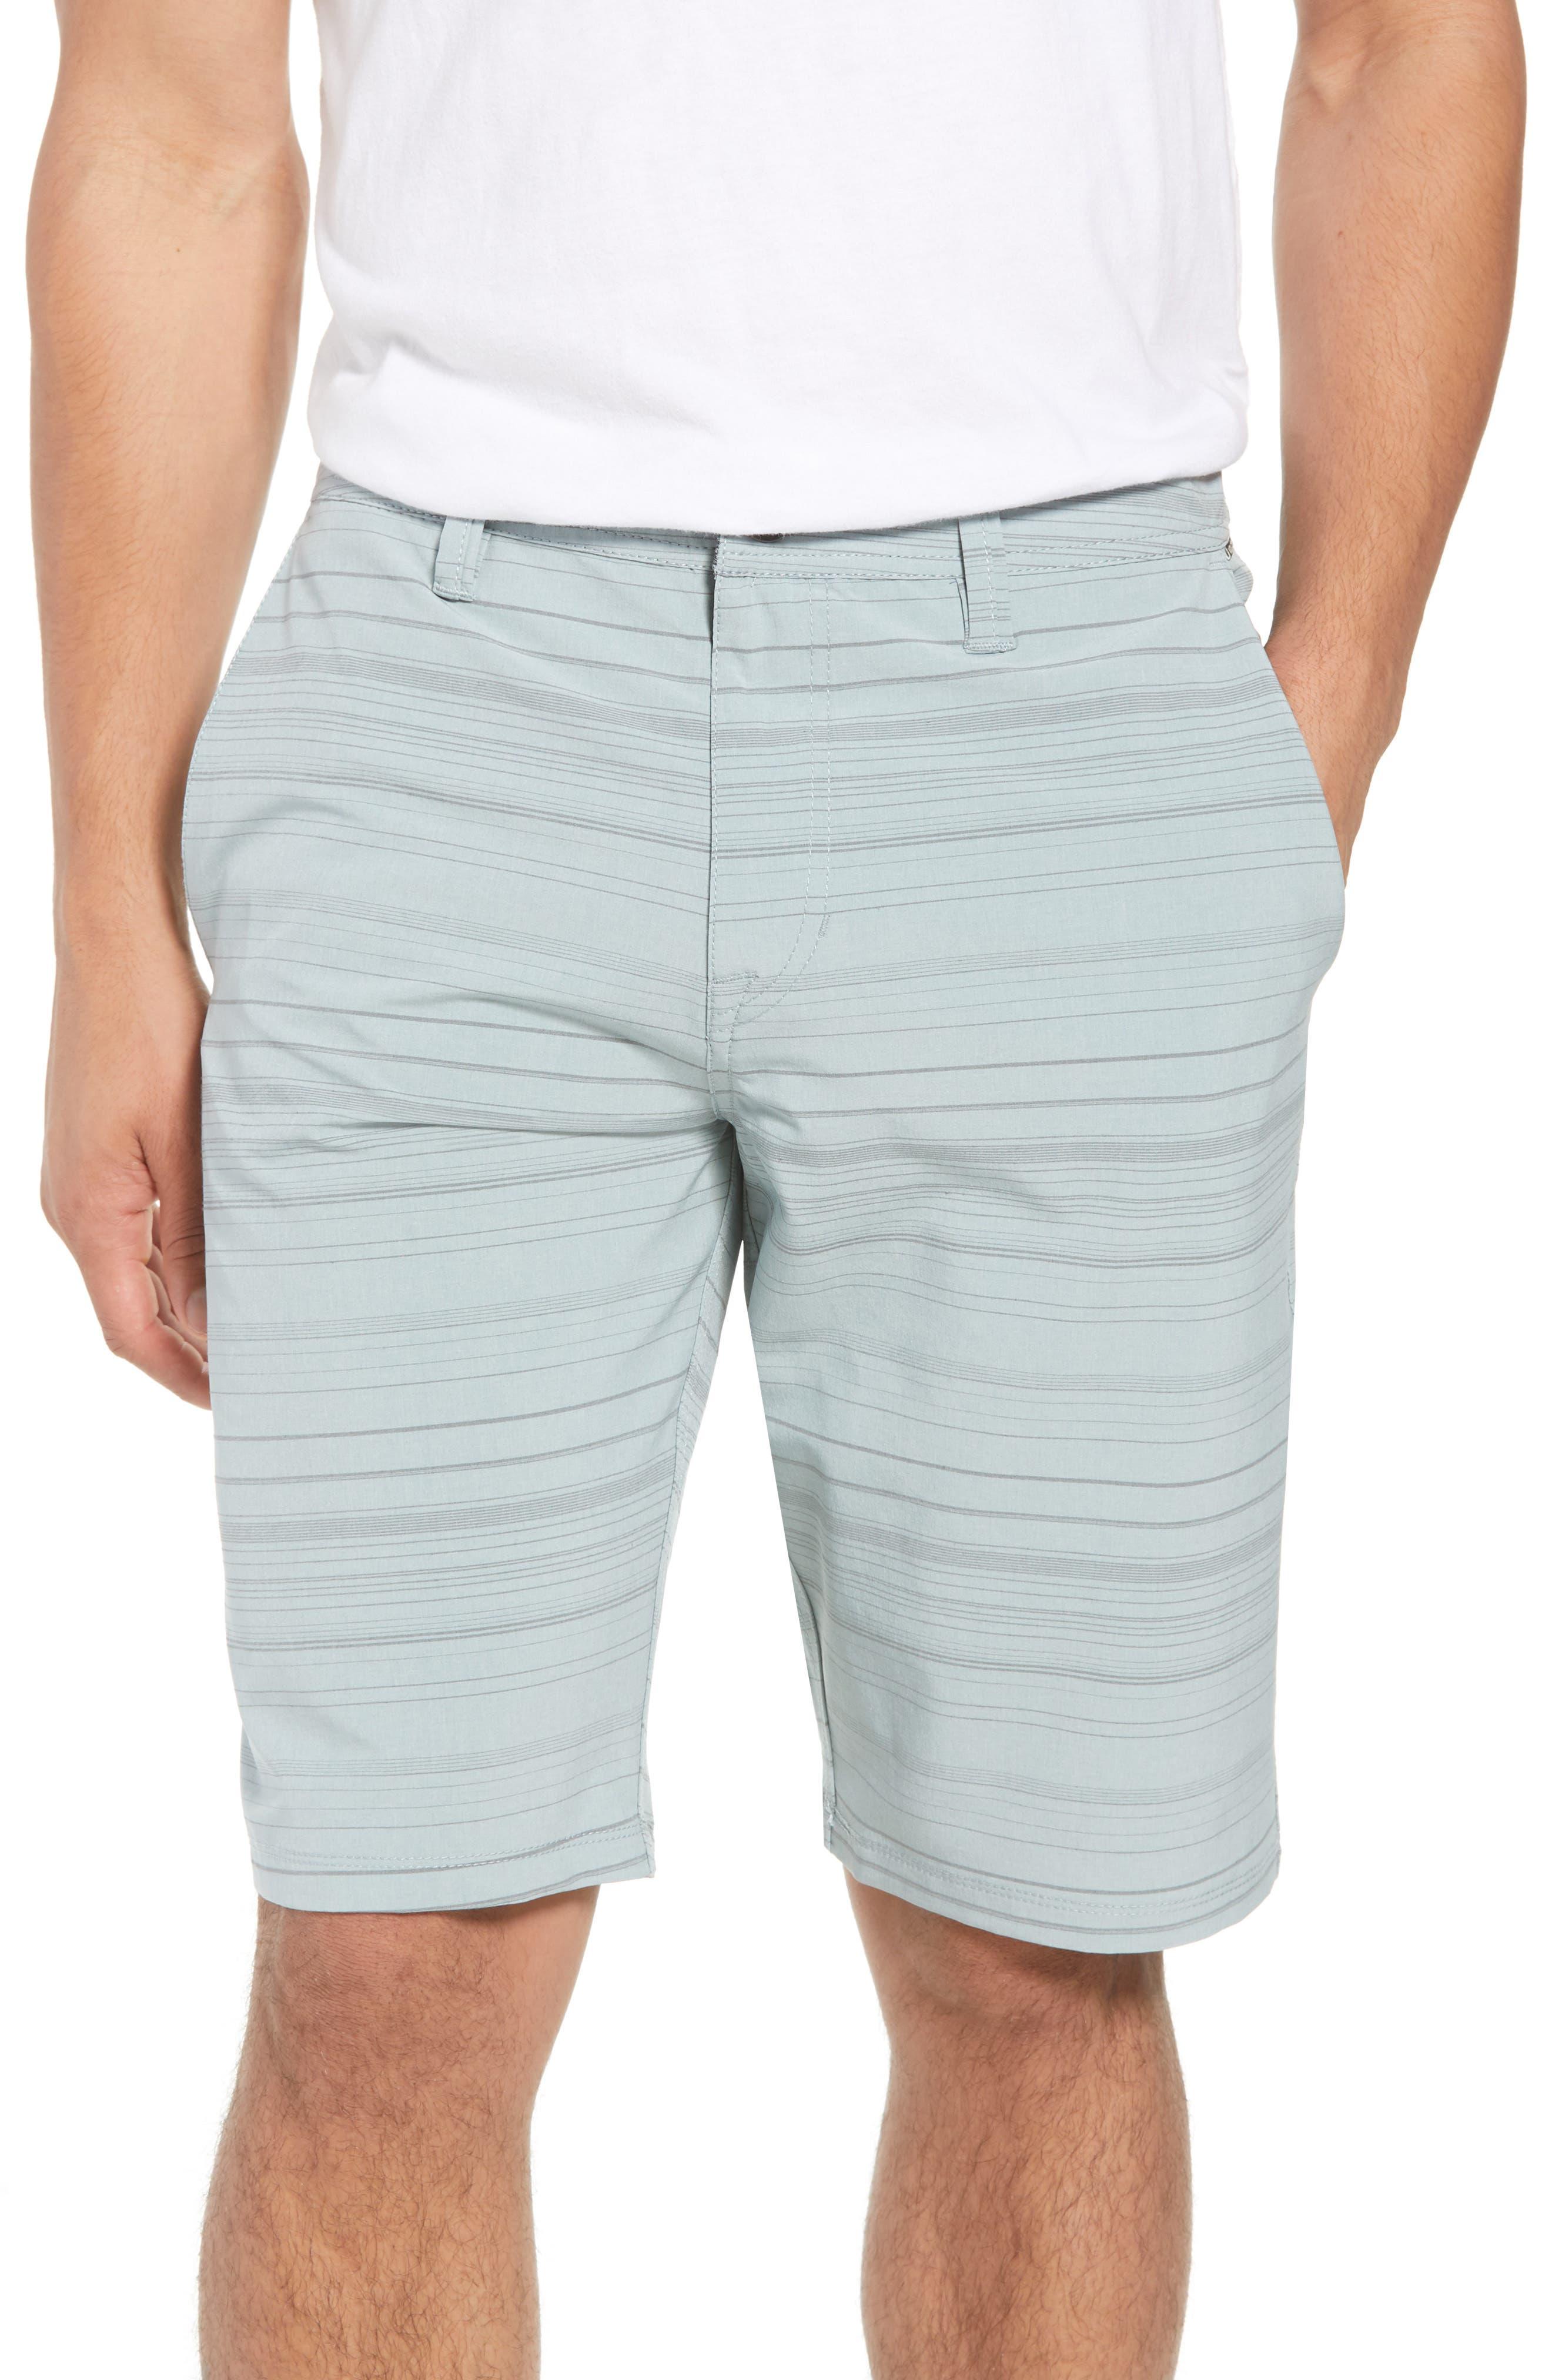 Surf N' Turf Mix Hybrid Shorts,                         Main,                         color, Lead